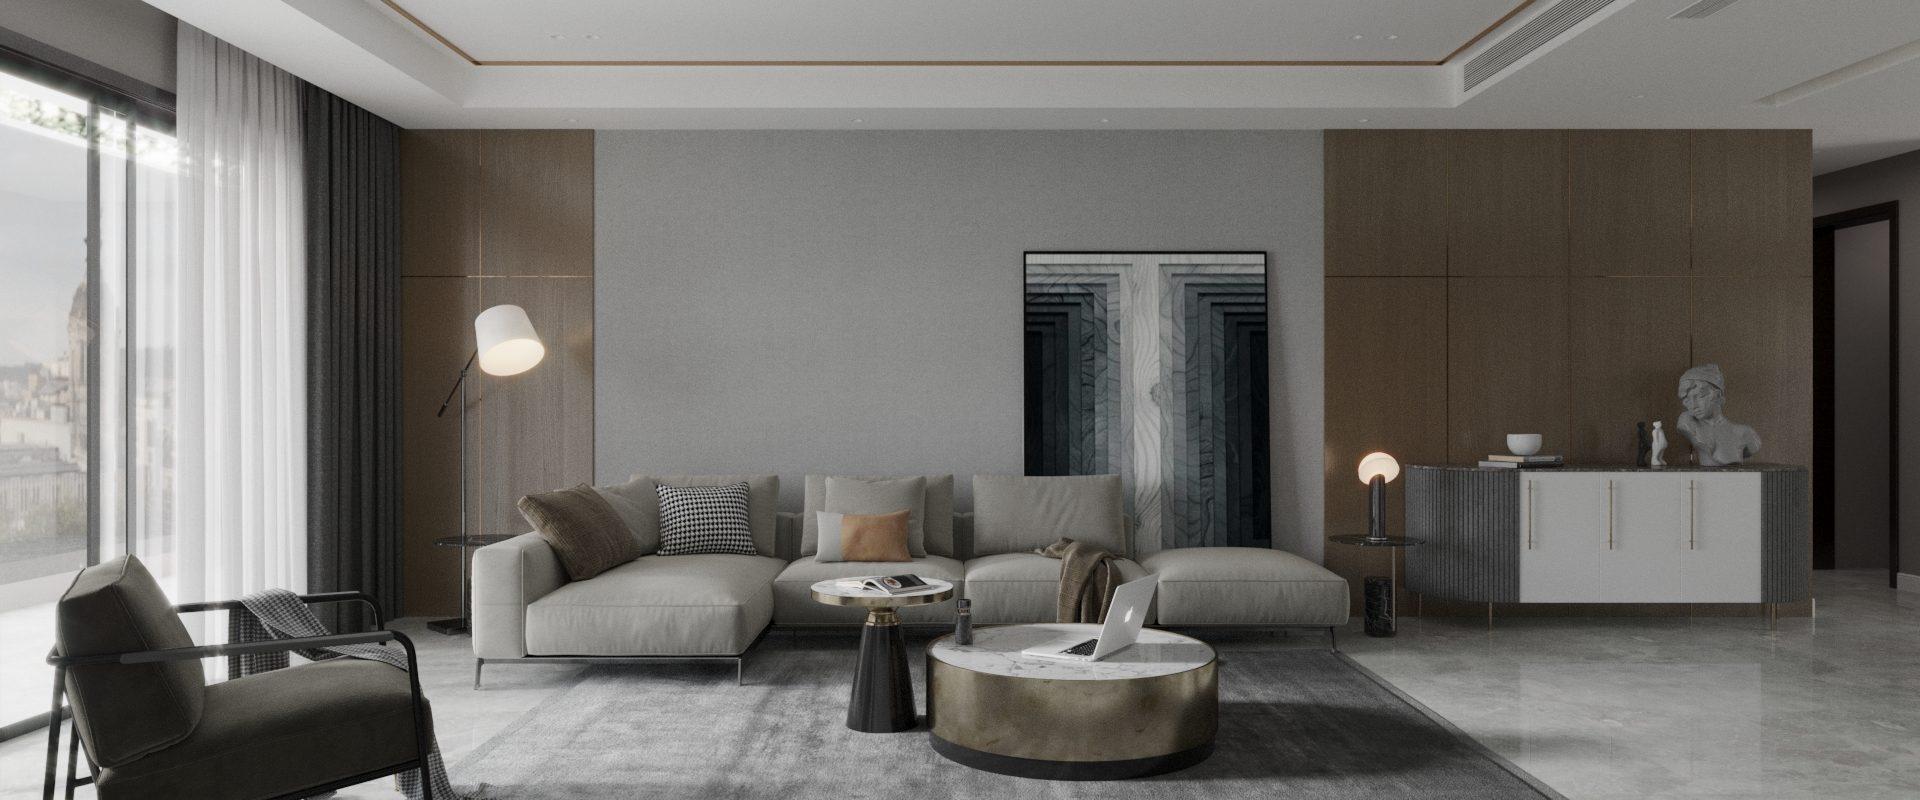 Villa dekorasyon_tasarim_000003_R_0002